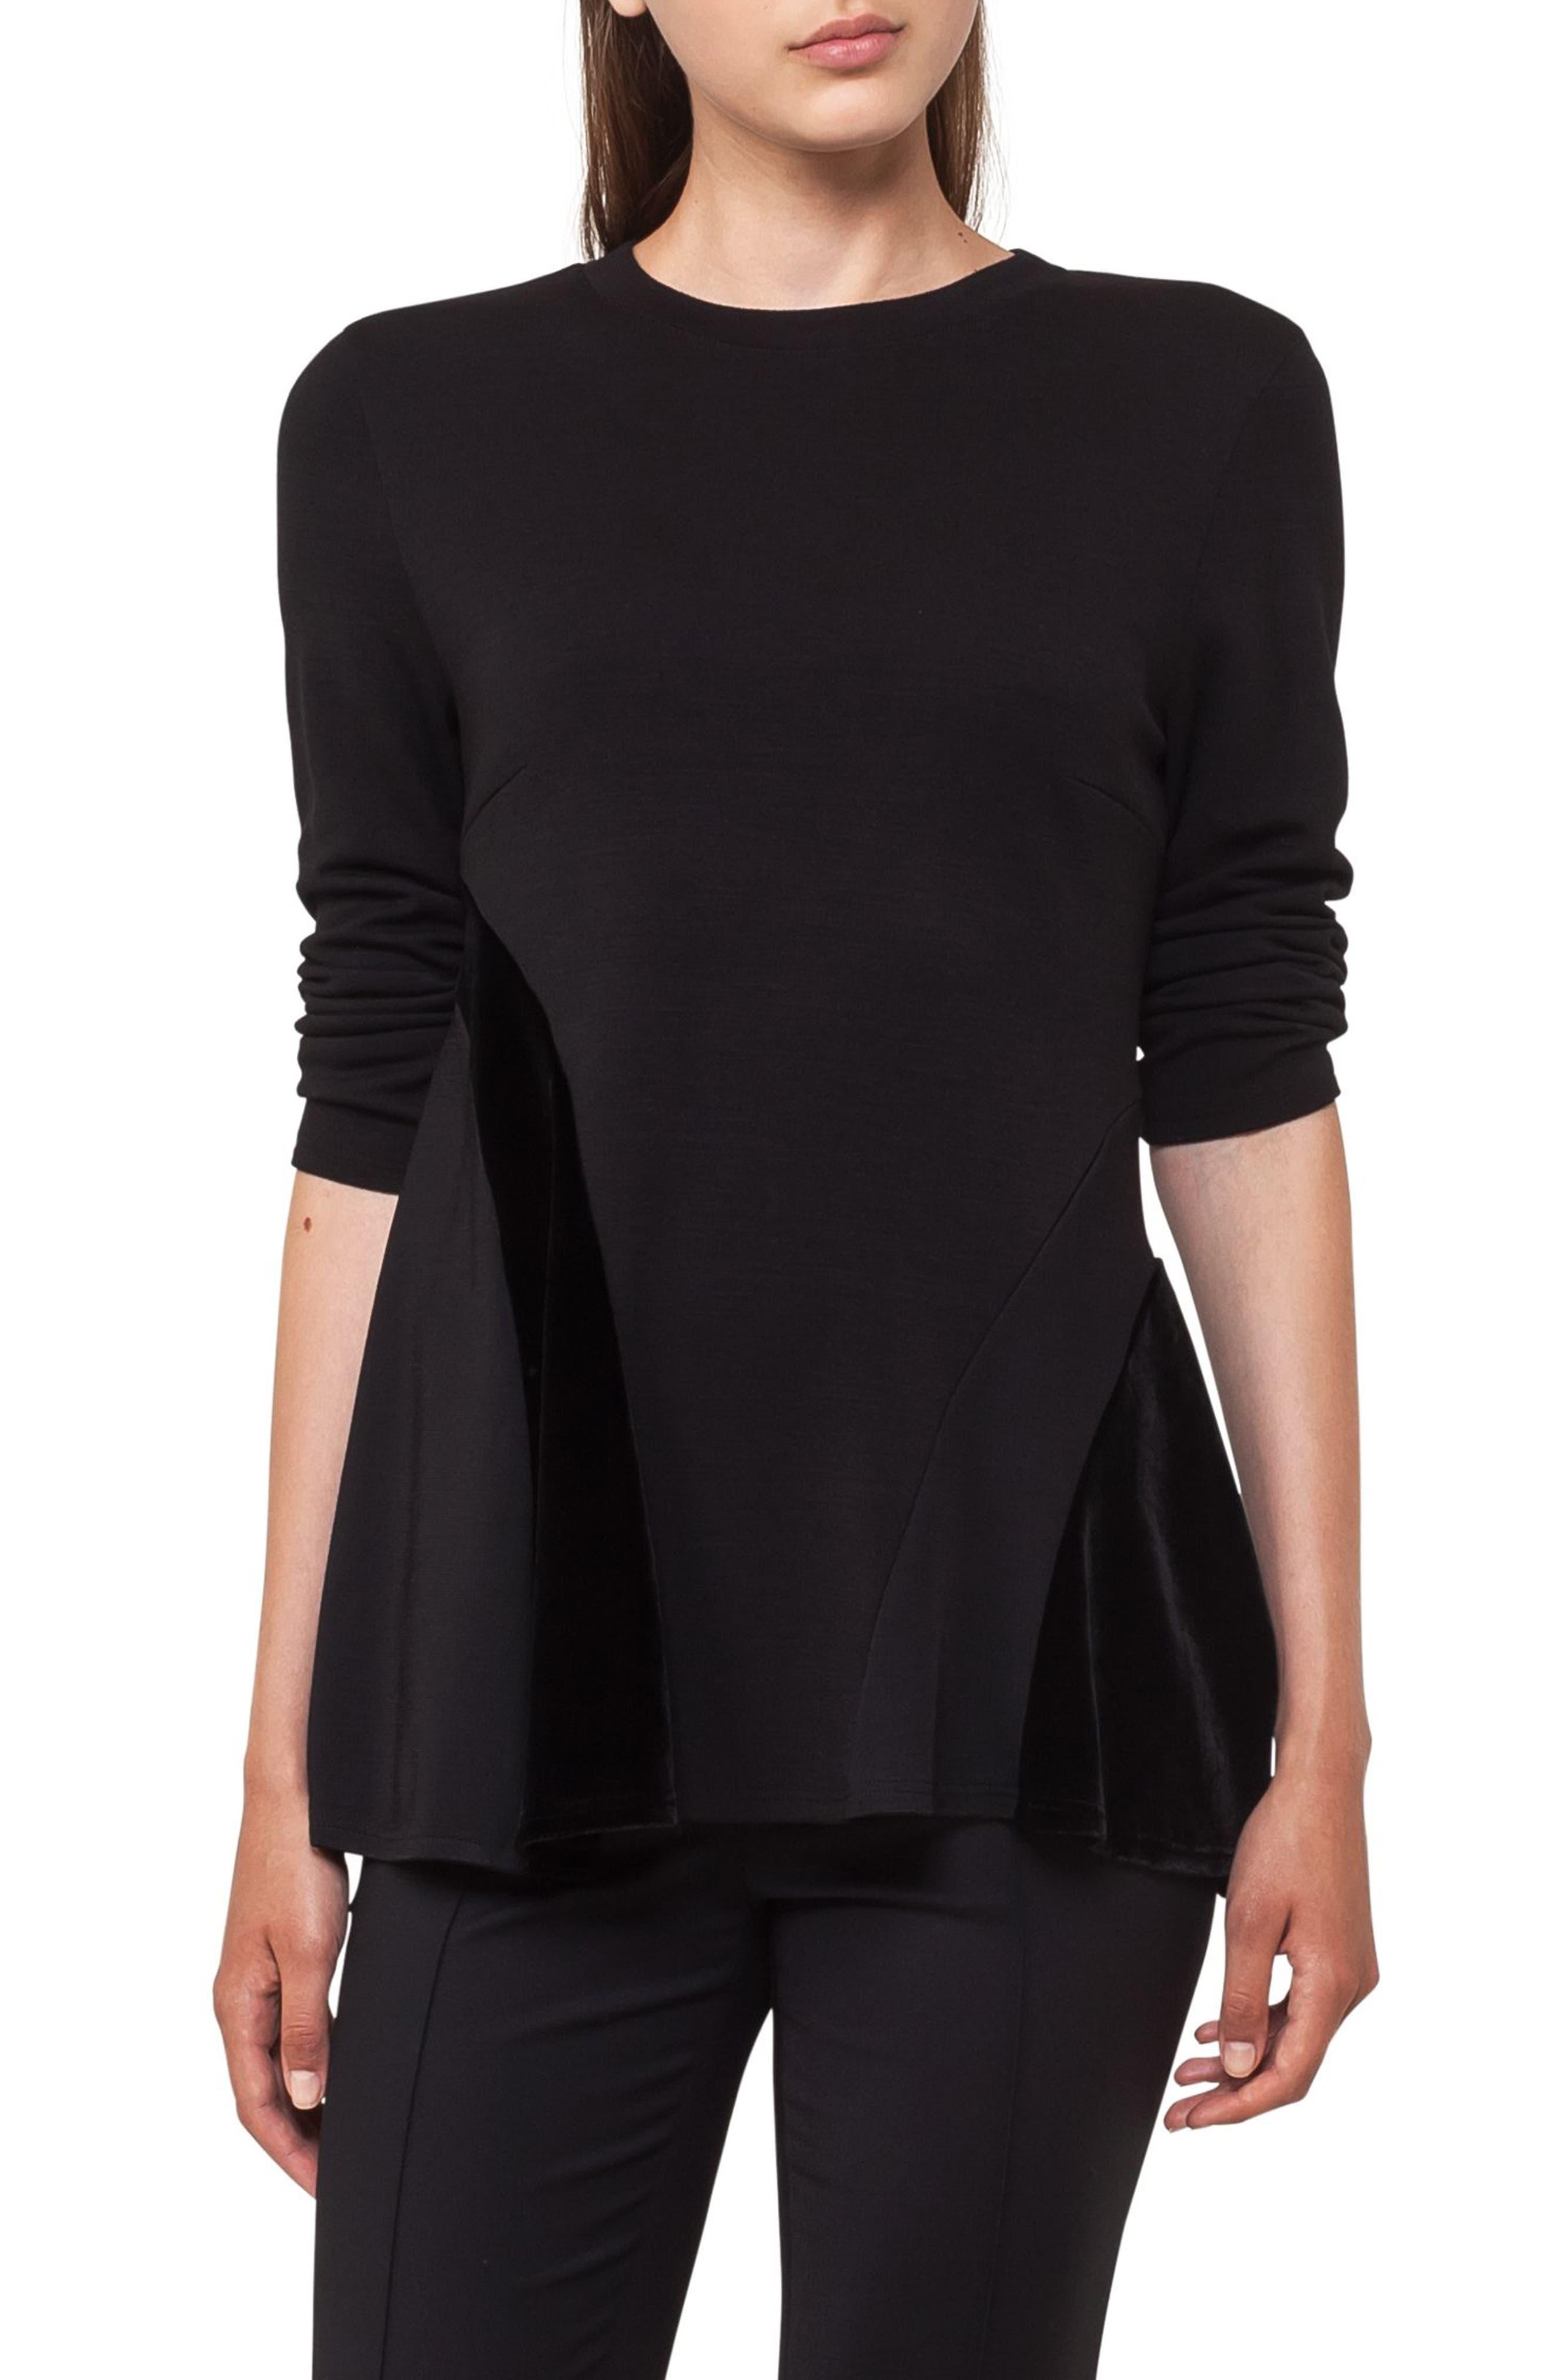 AKRIS PUNTO Quad Circle Sweatshirt, Main, color, 009